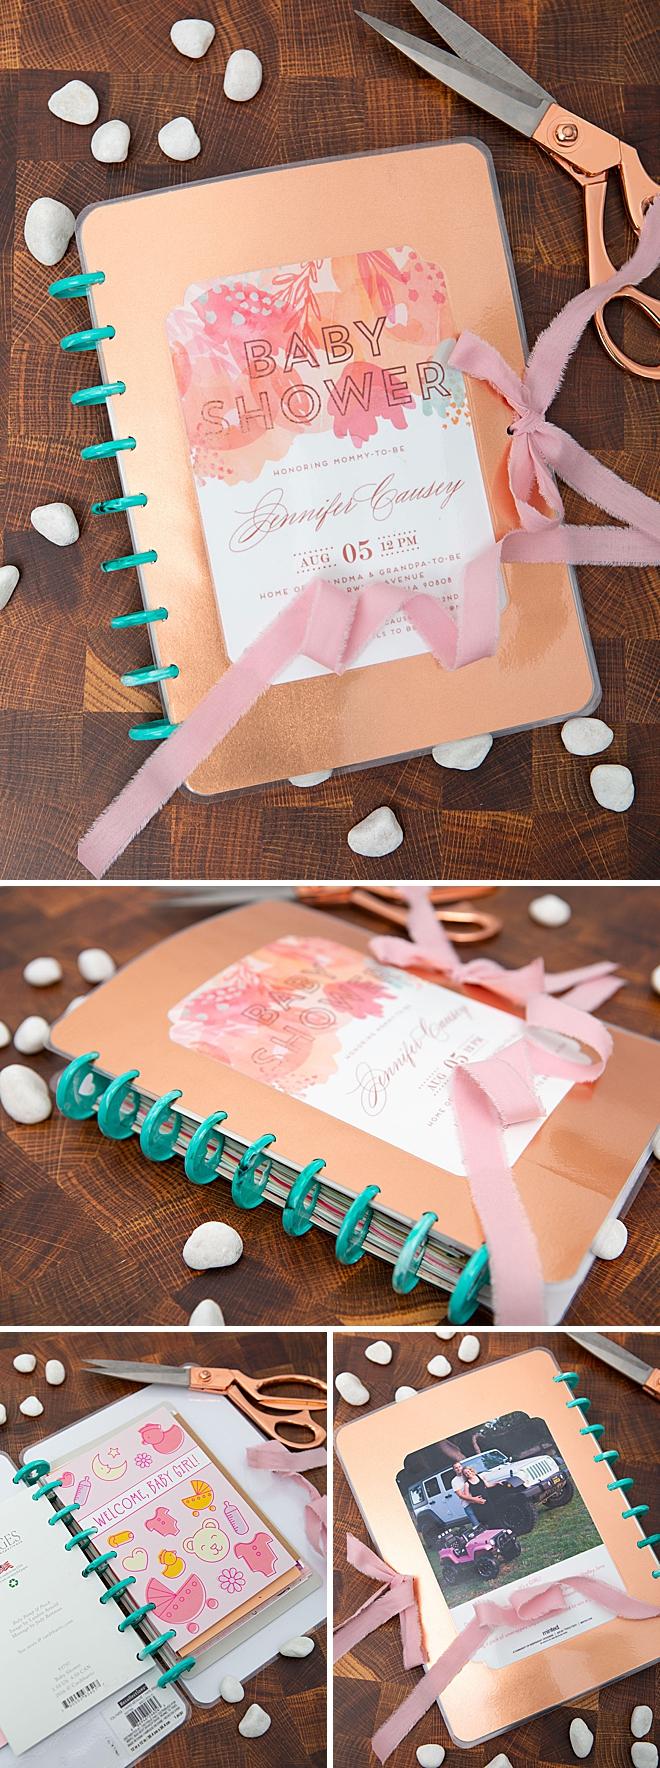 How to make an adorable Christmas card keepsake book!